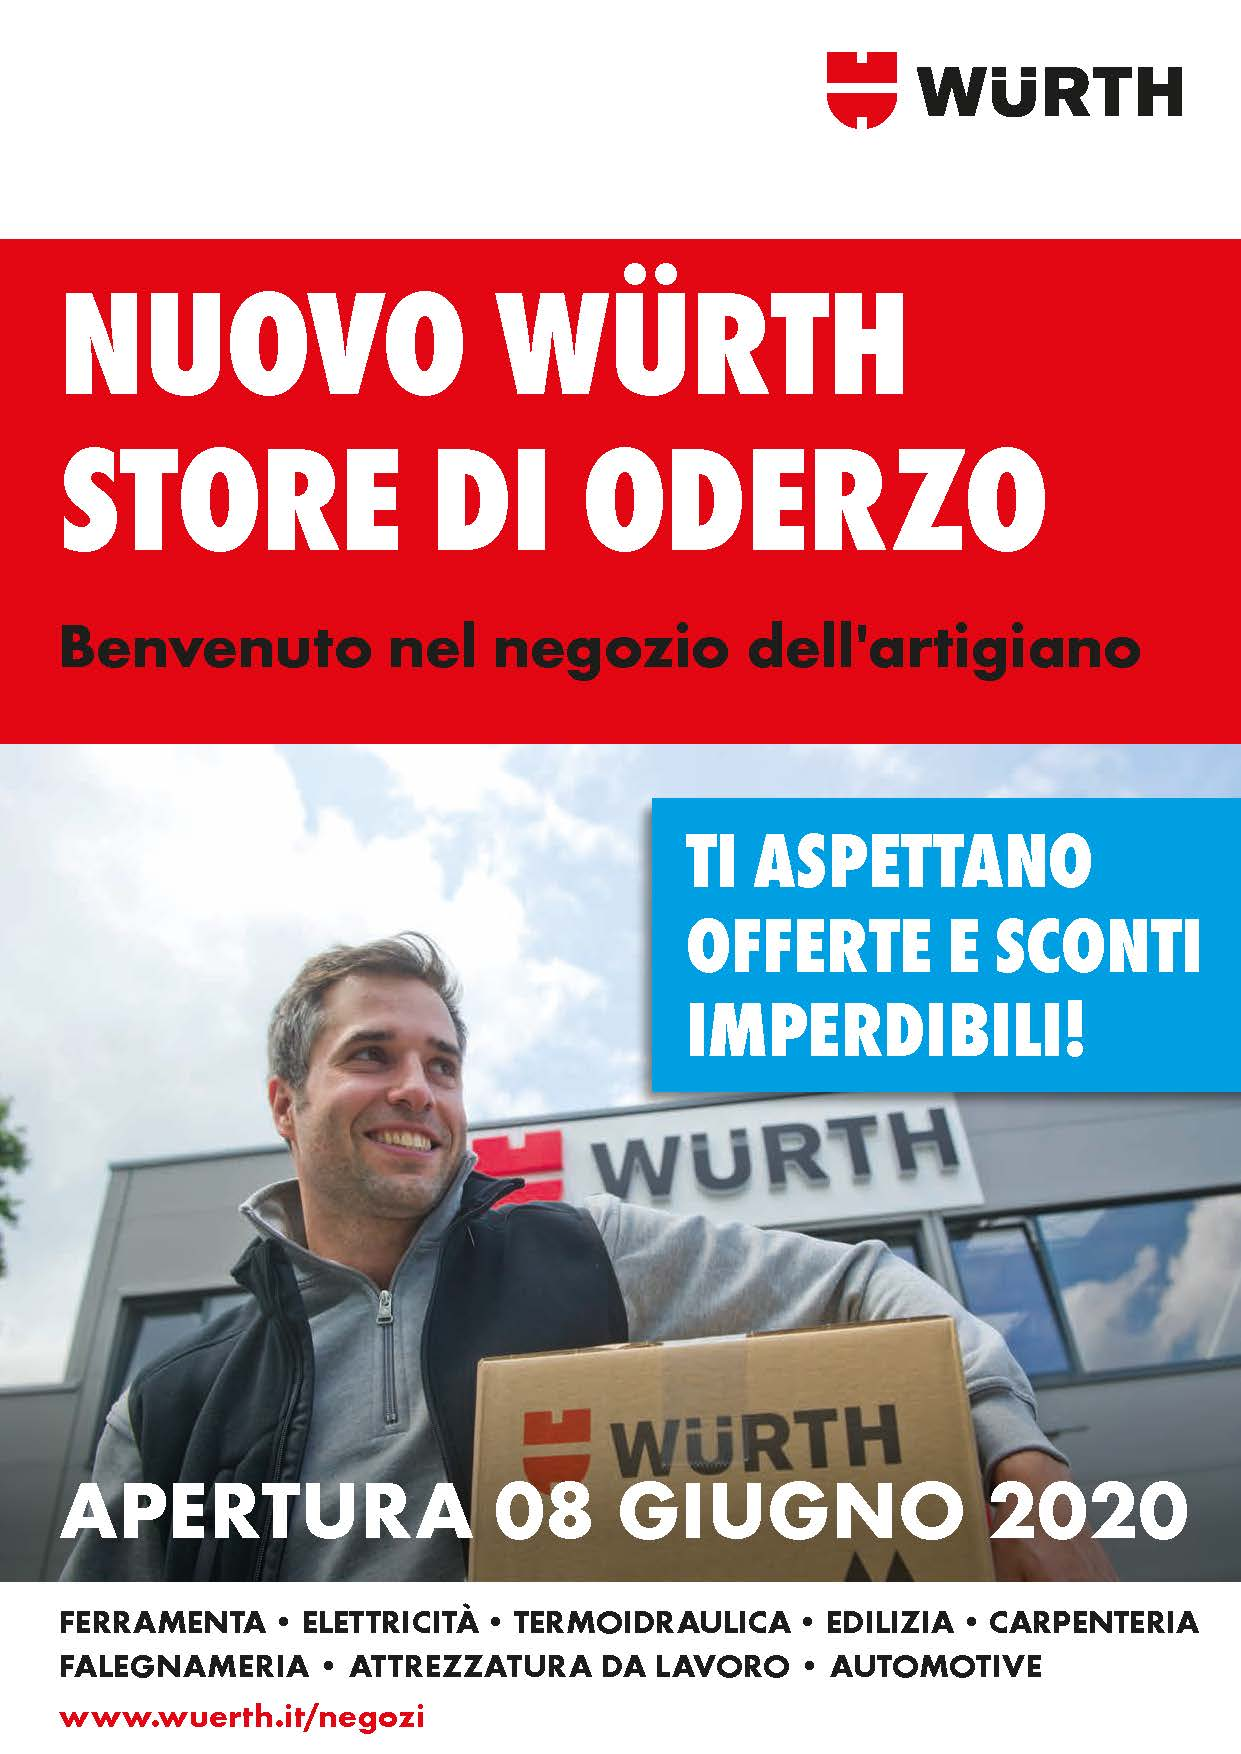 wurth-store-oderzo